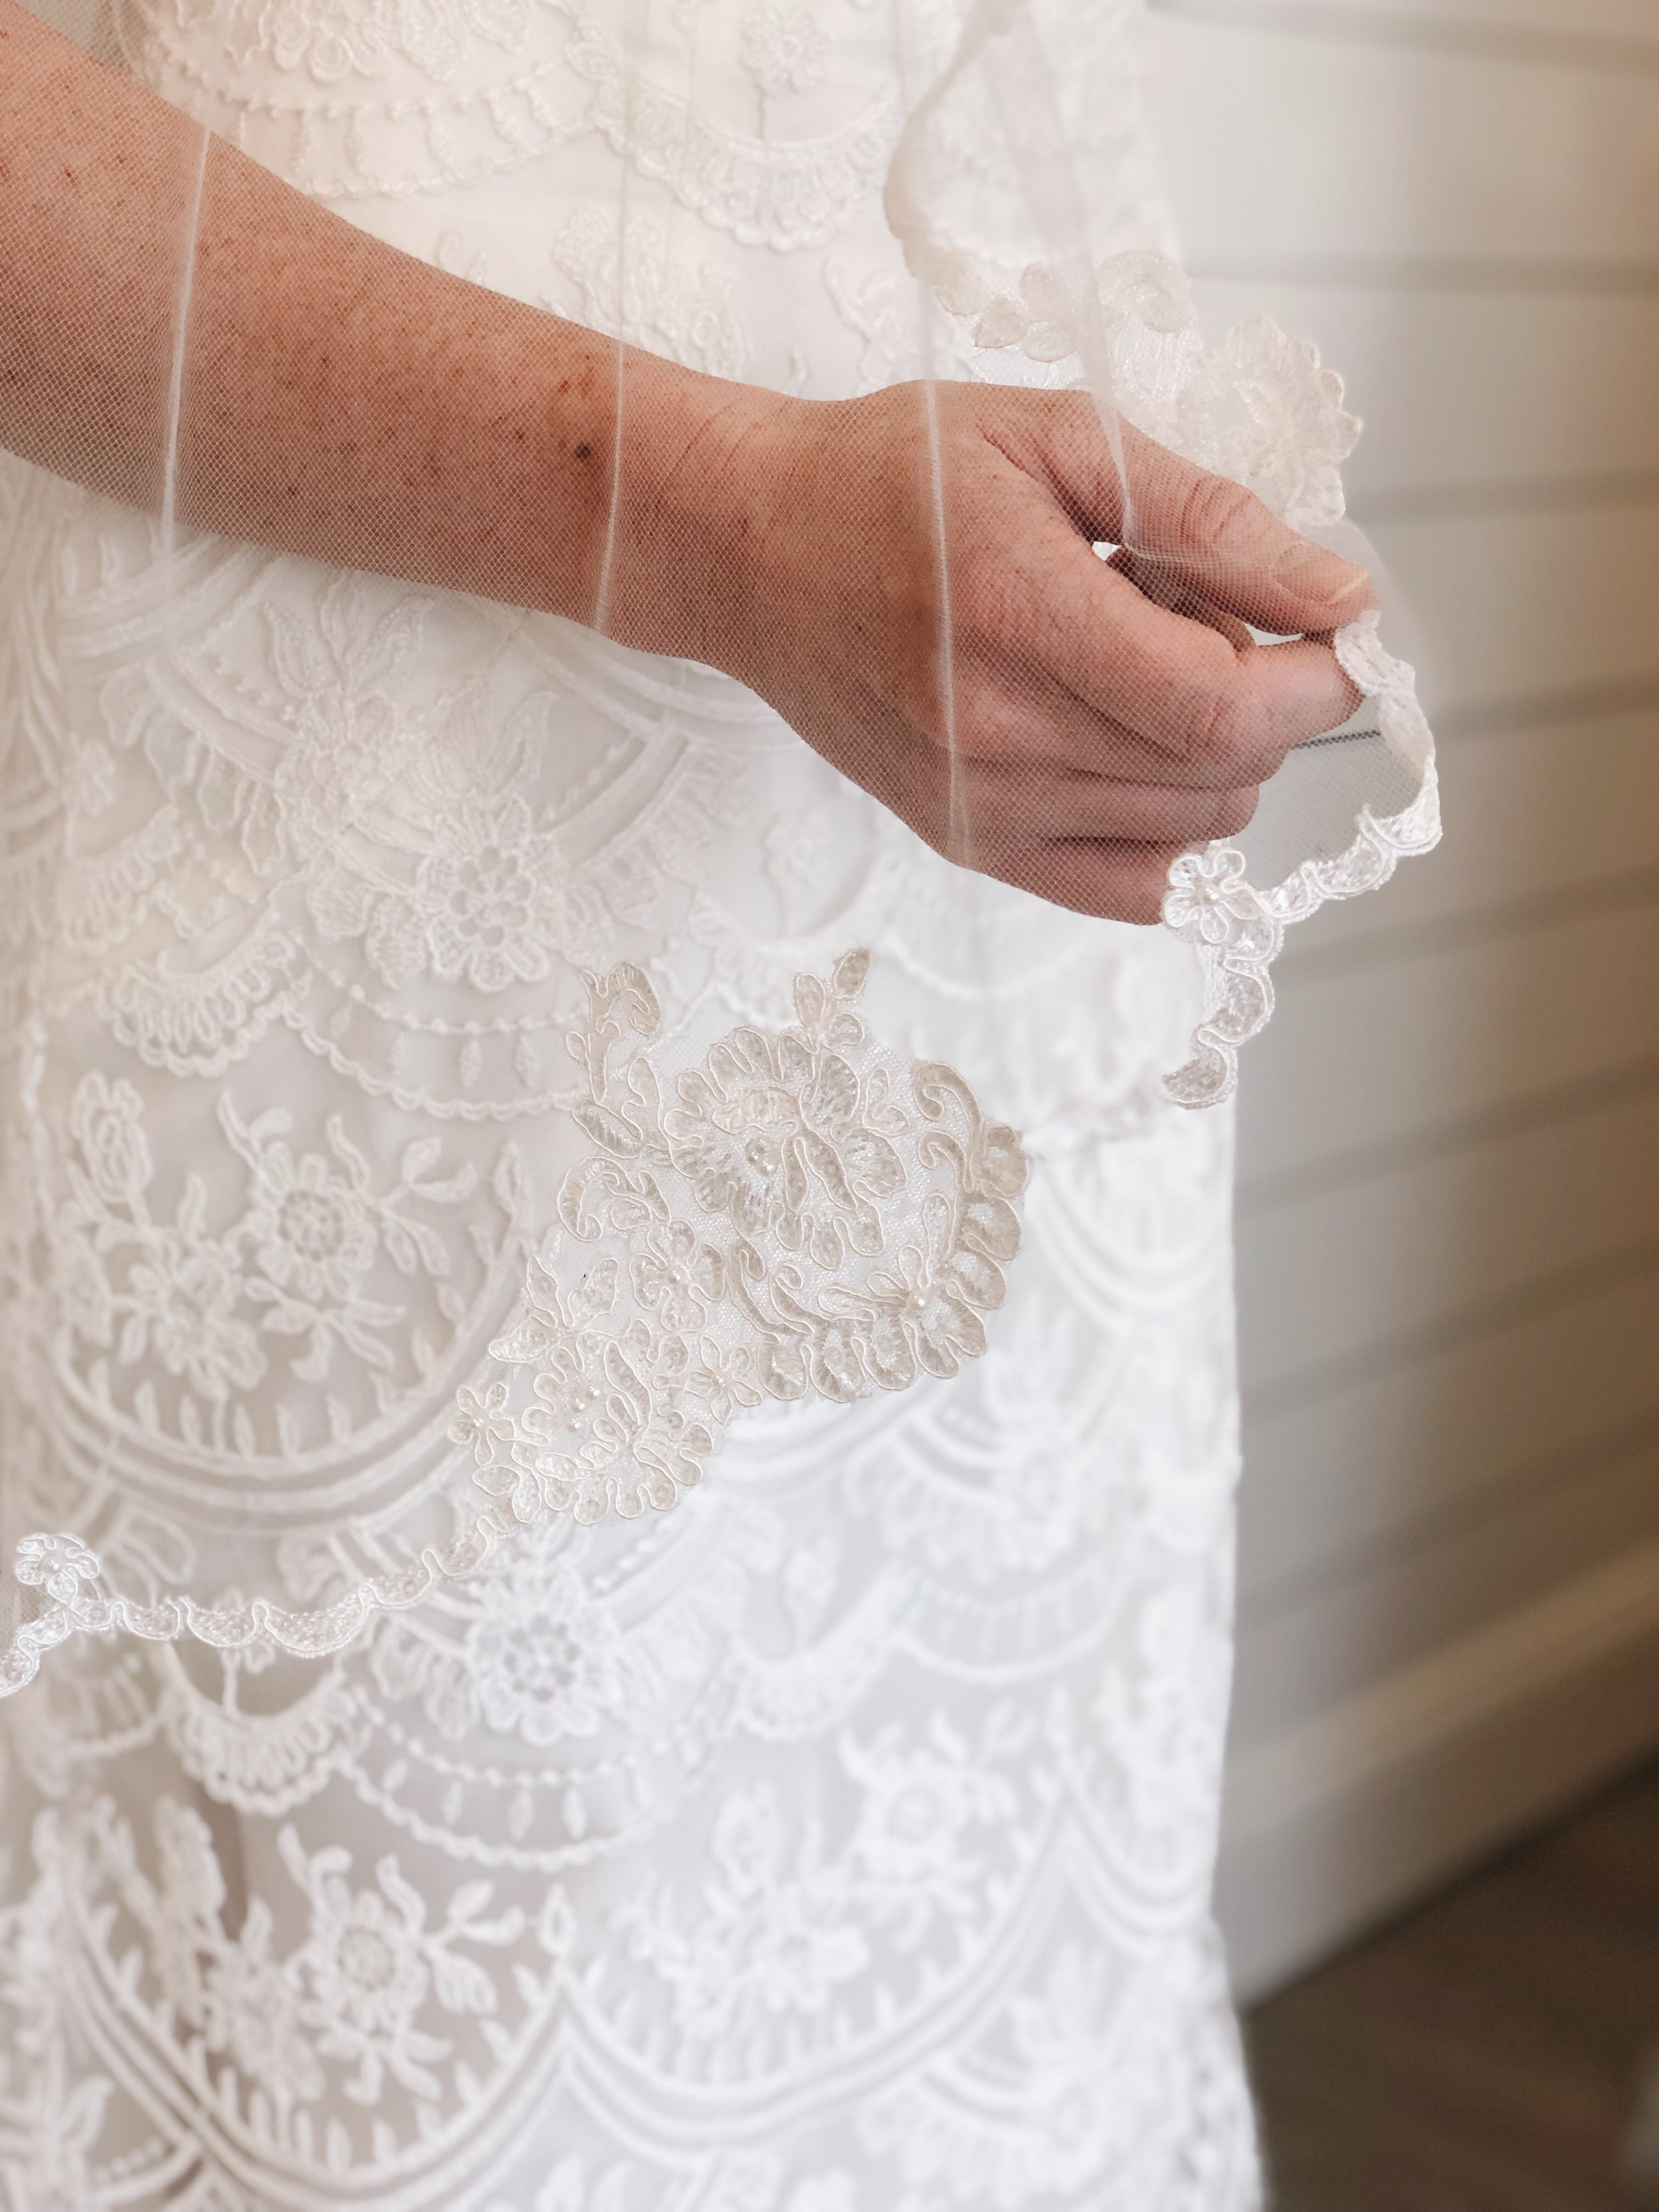 lace veil detail.JPG